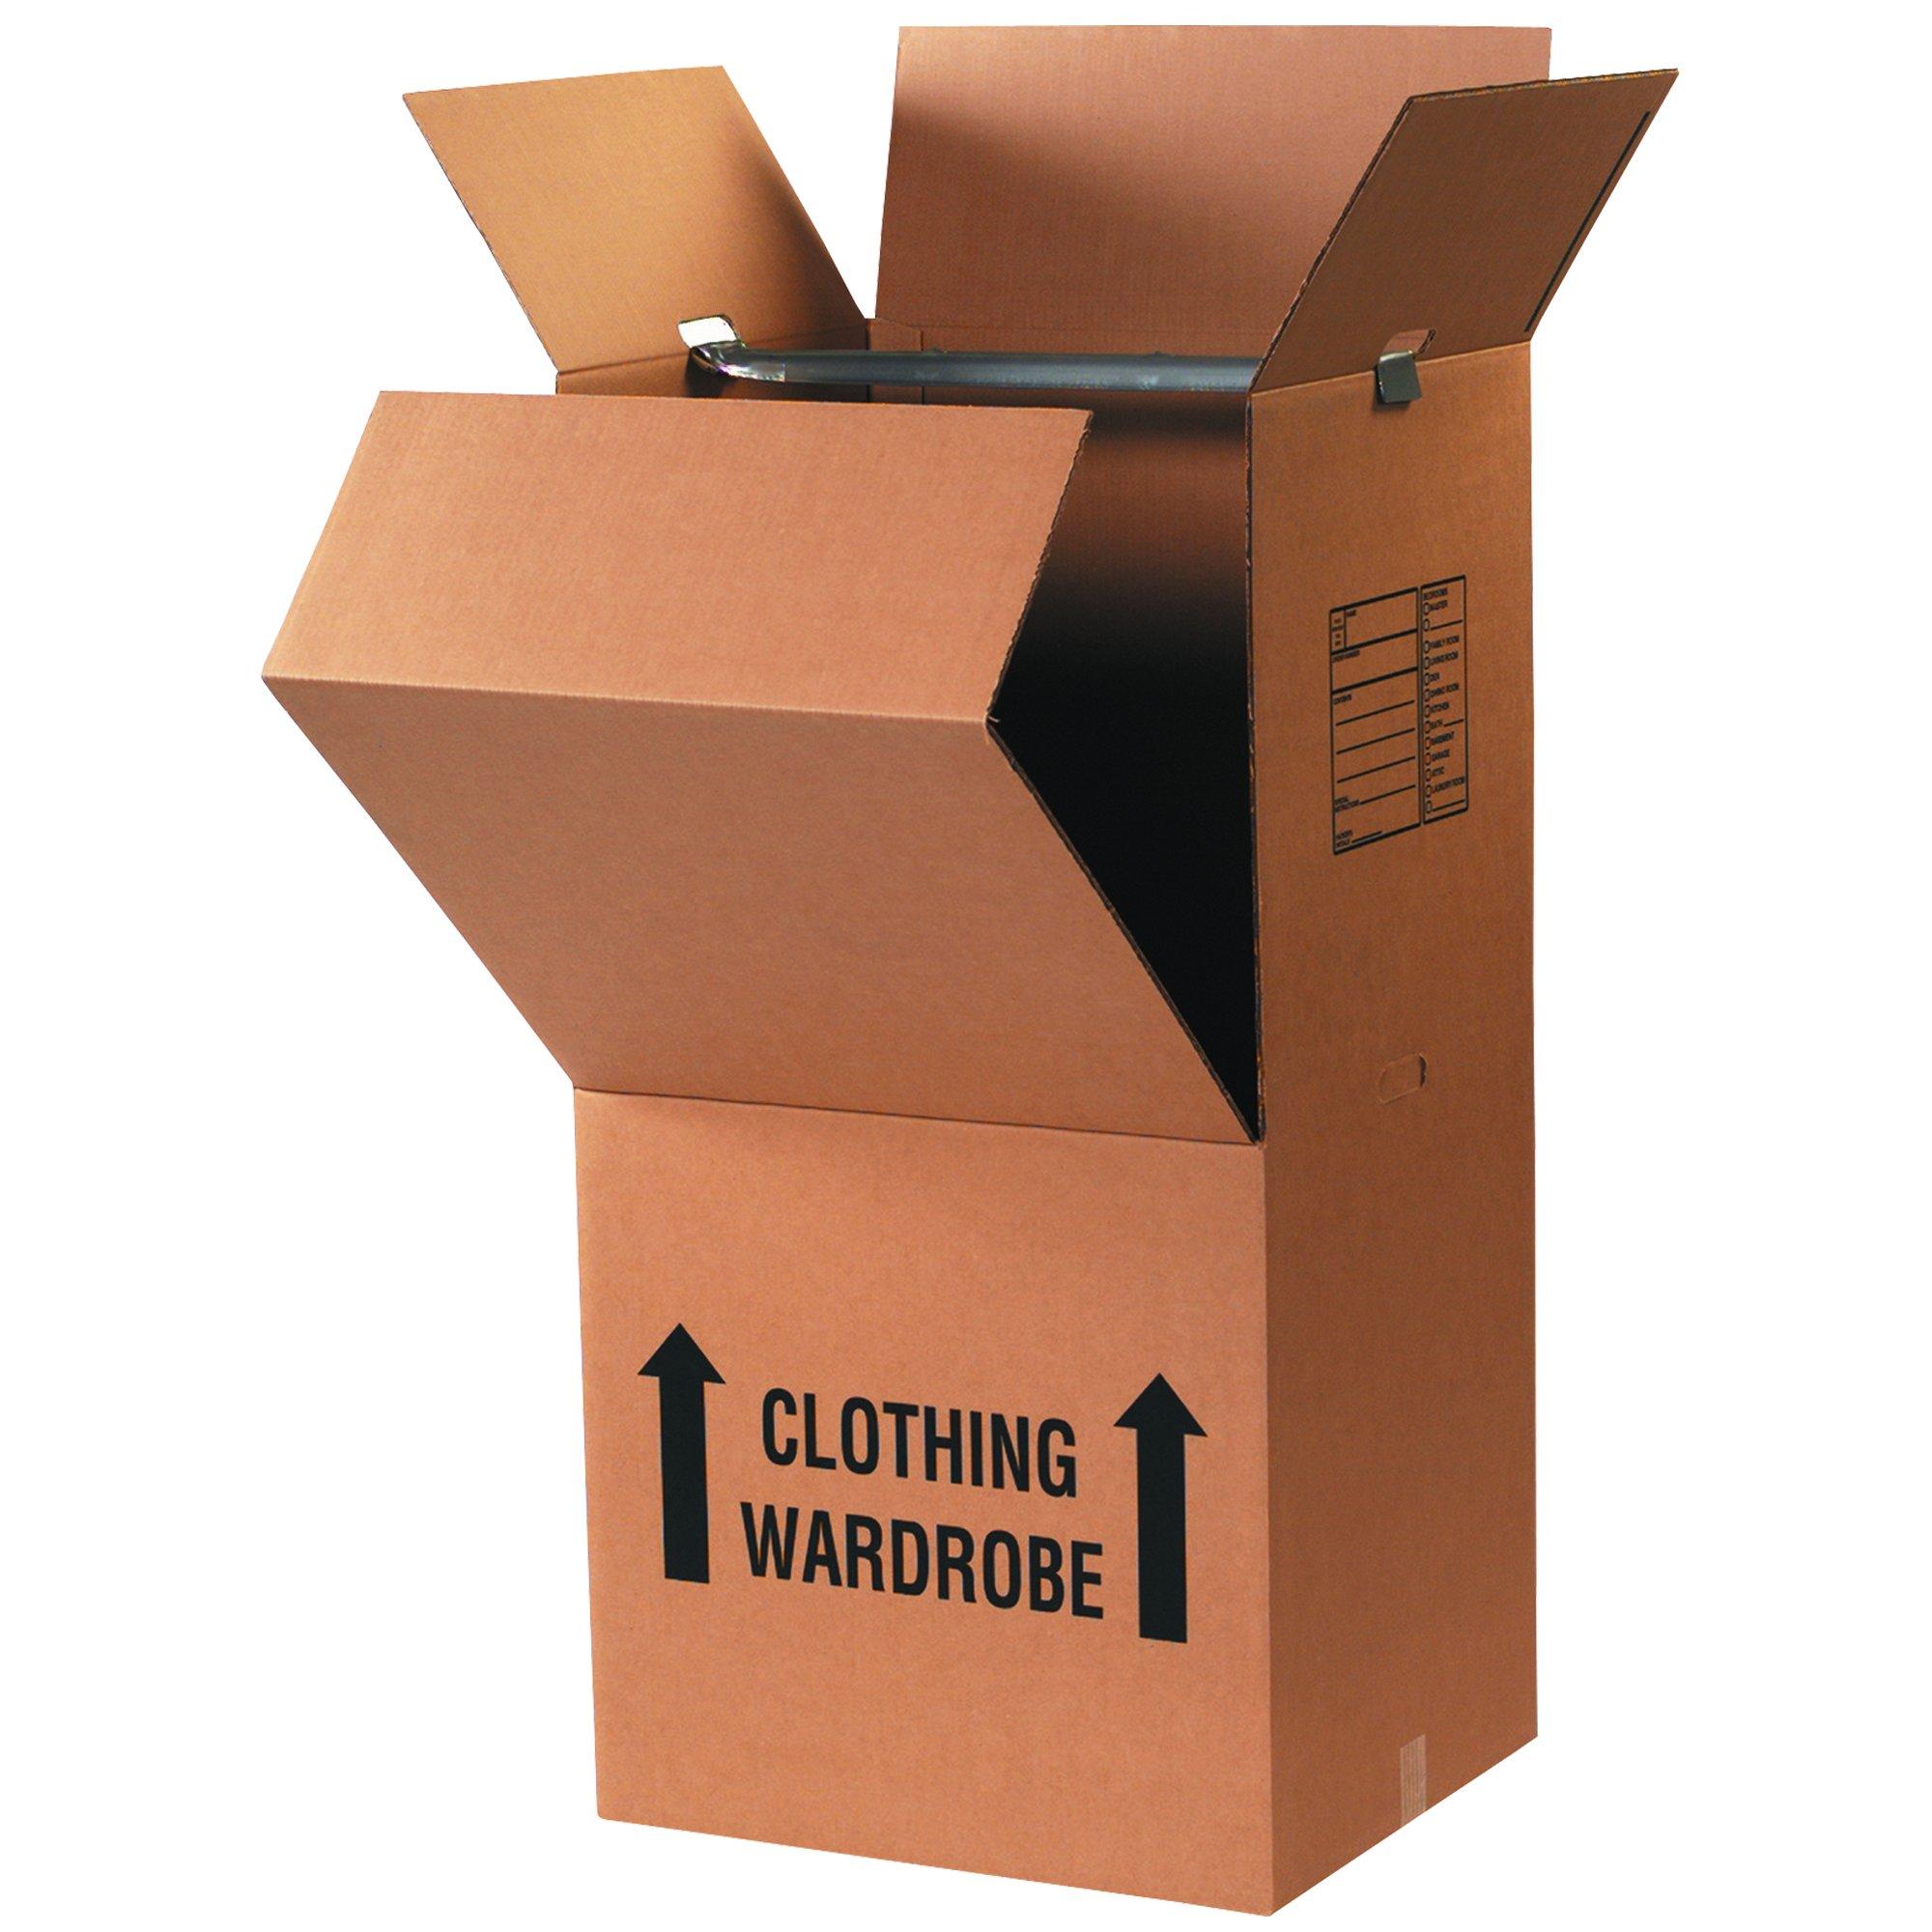 Tape Logic TLWARDCOMBO Wardrobe Box Combo Pack, Kraft, 3 Sets (Pack of 3) by Tape Logic